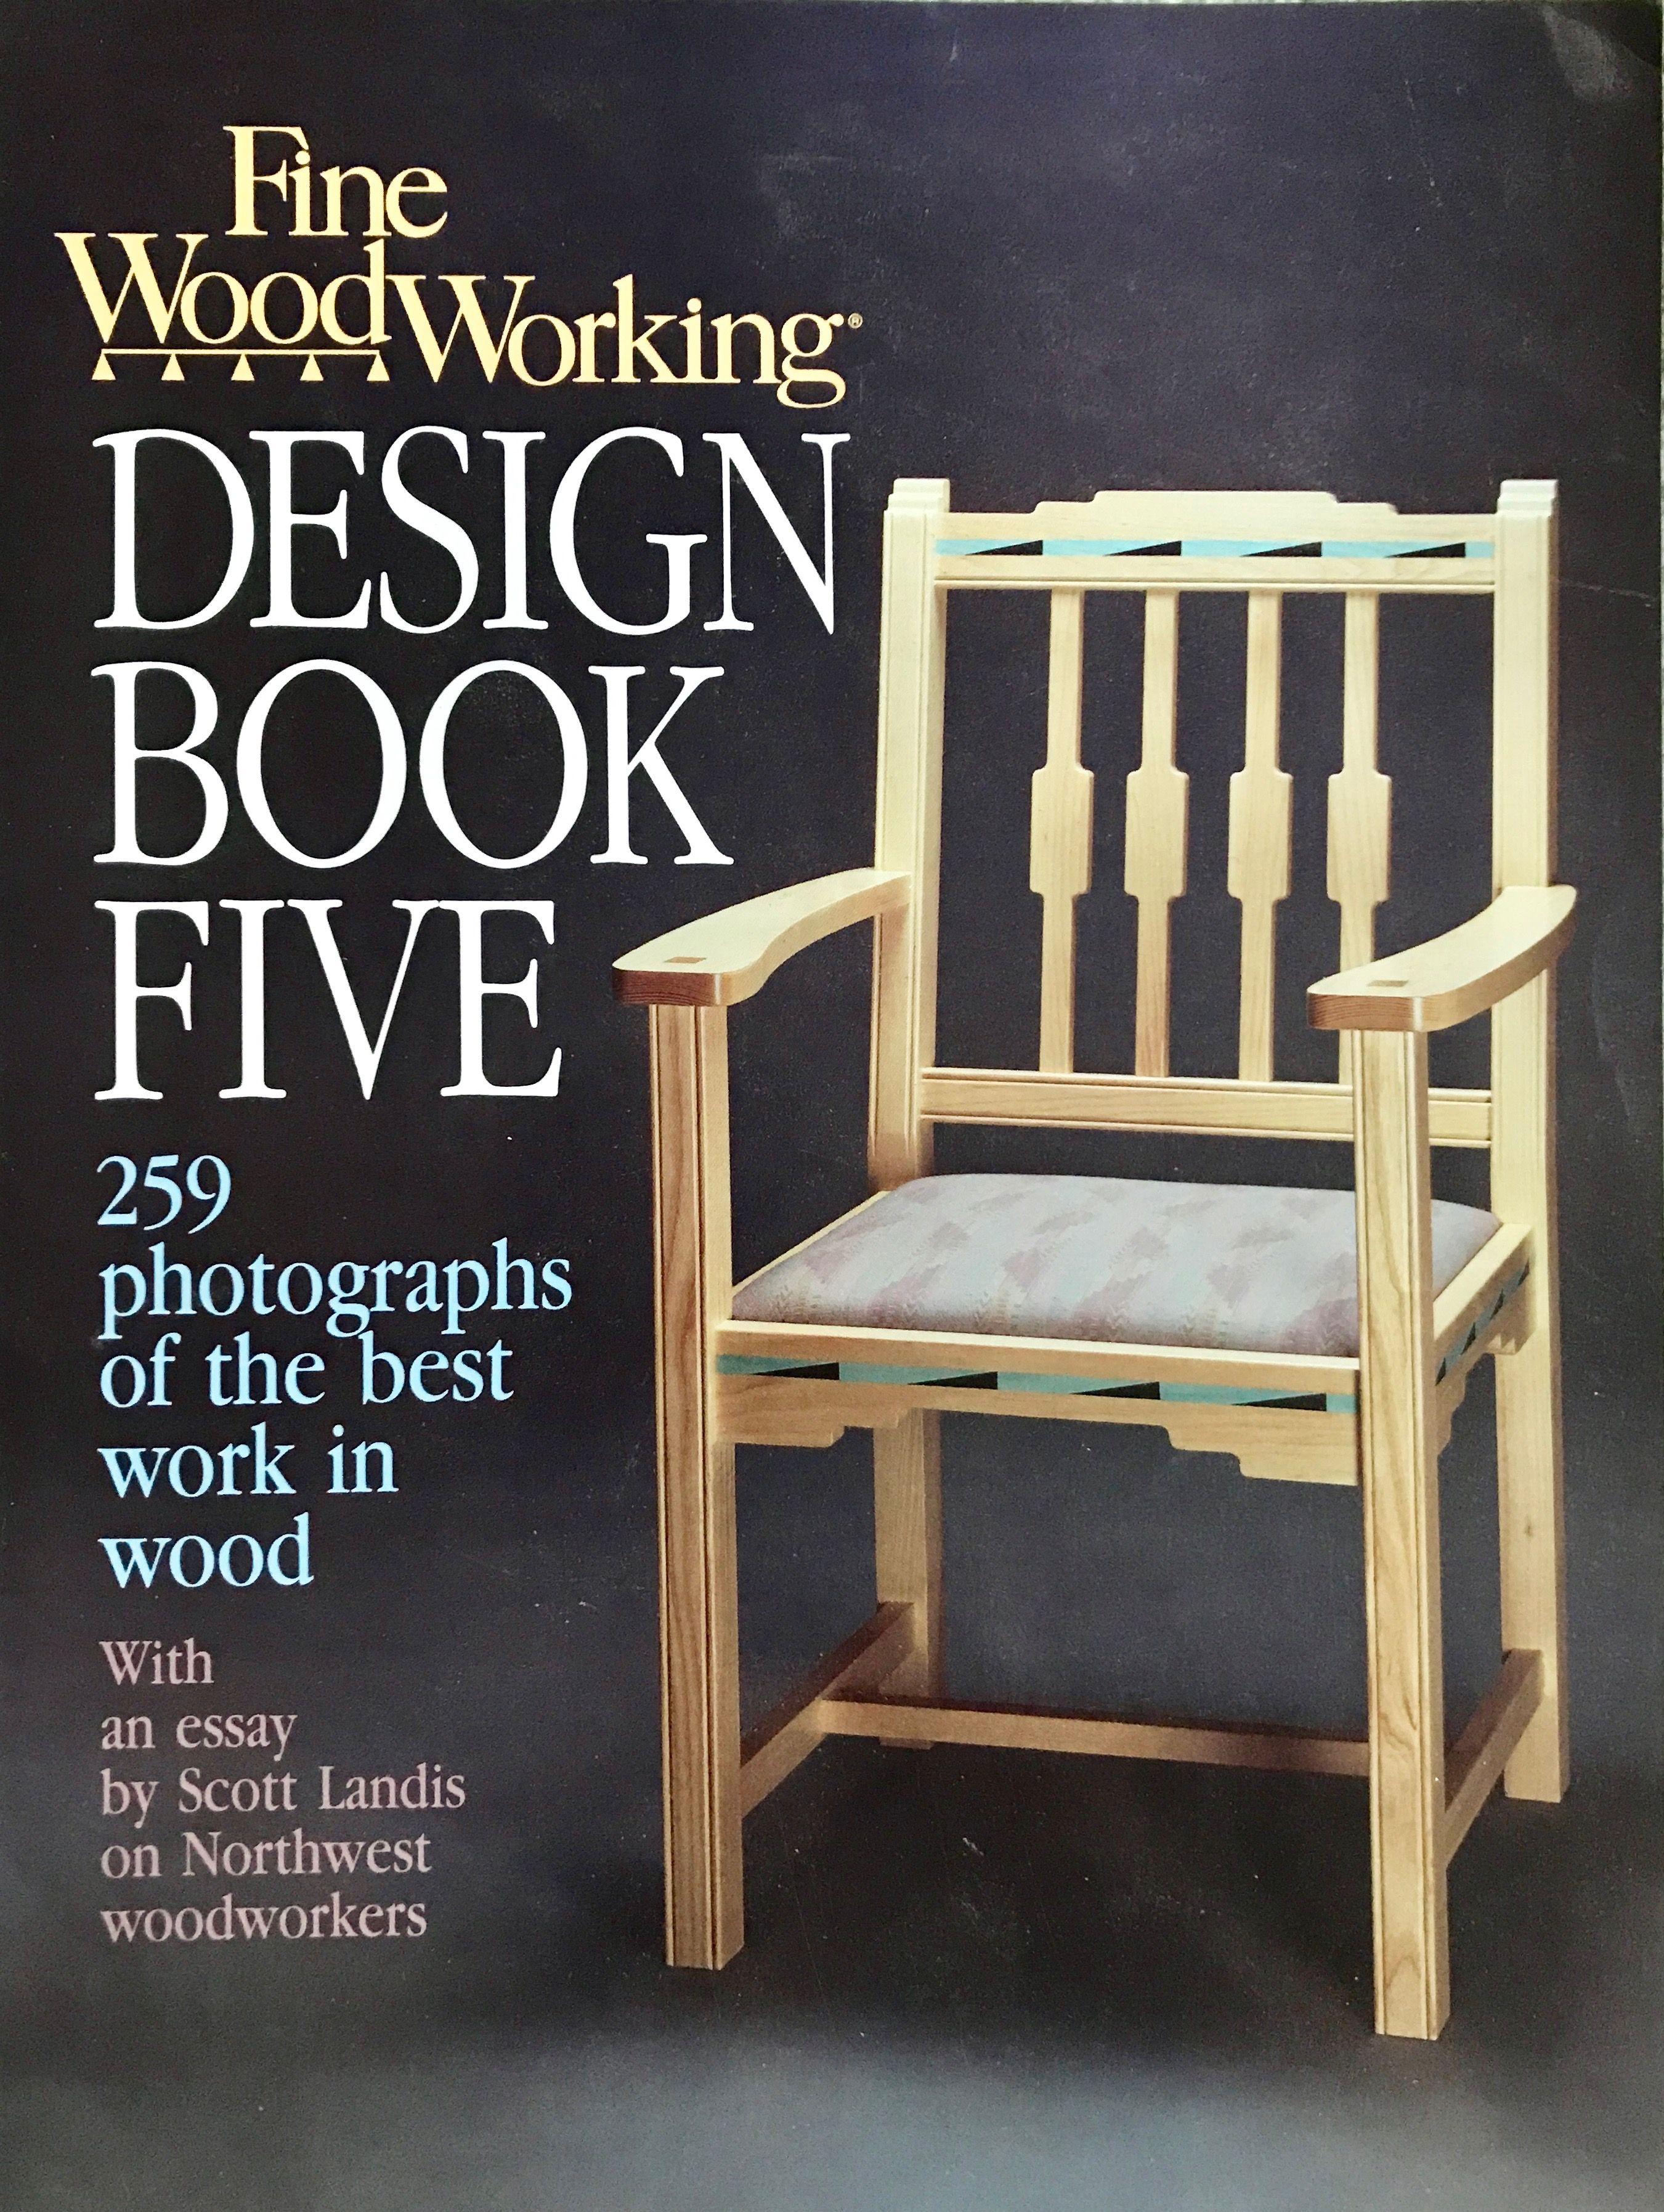 fine woodworking design book fivefine woodworking, 1990